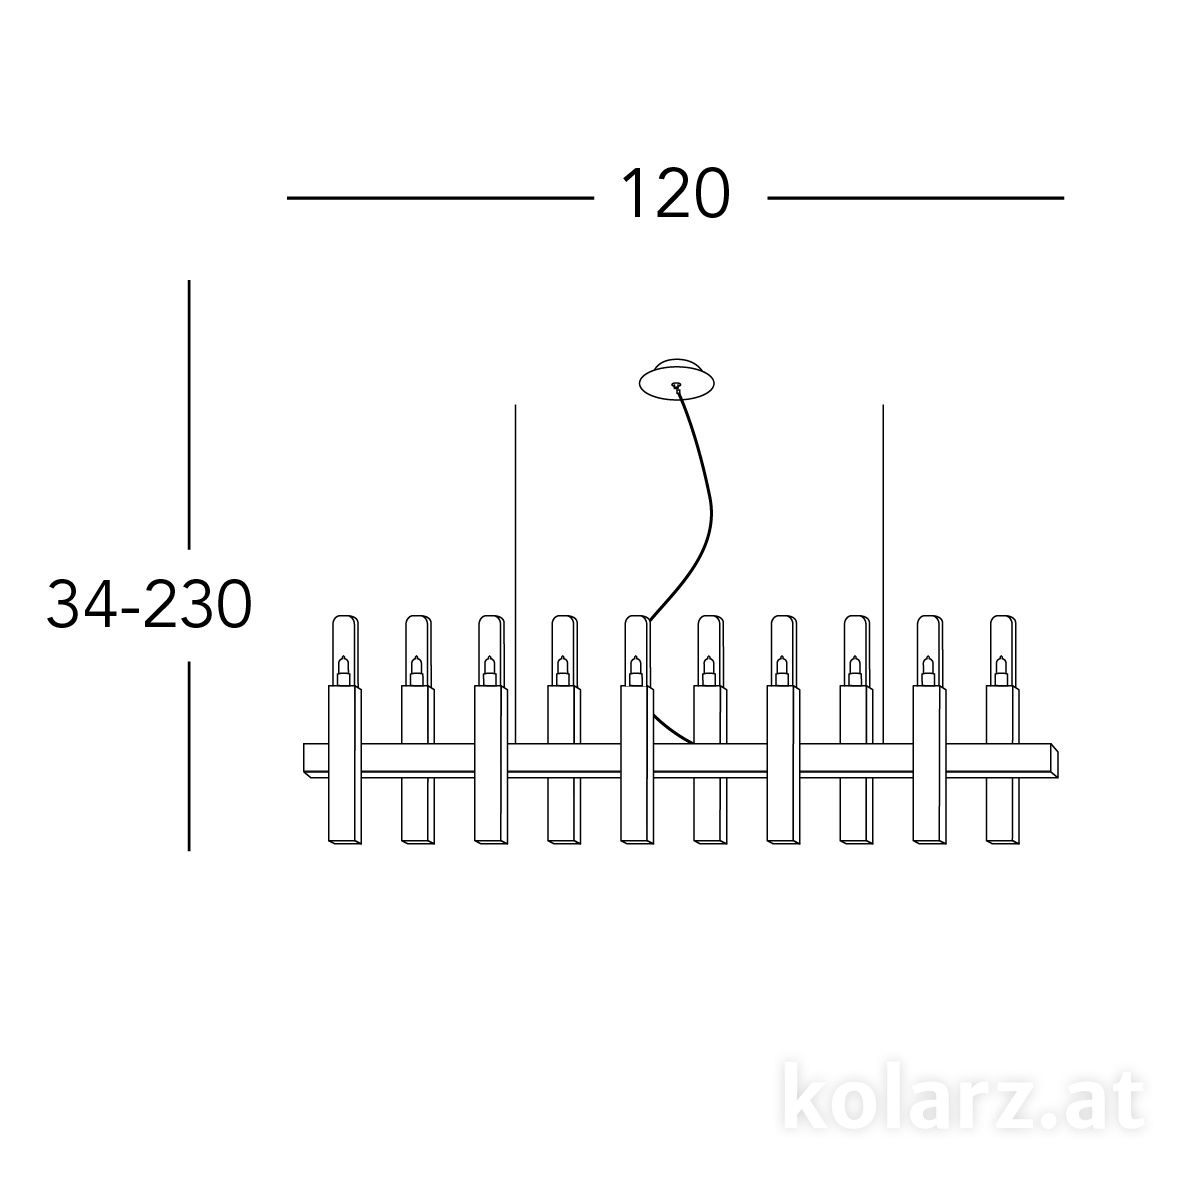 6030-81031-s1.jpg